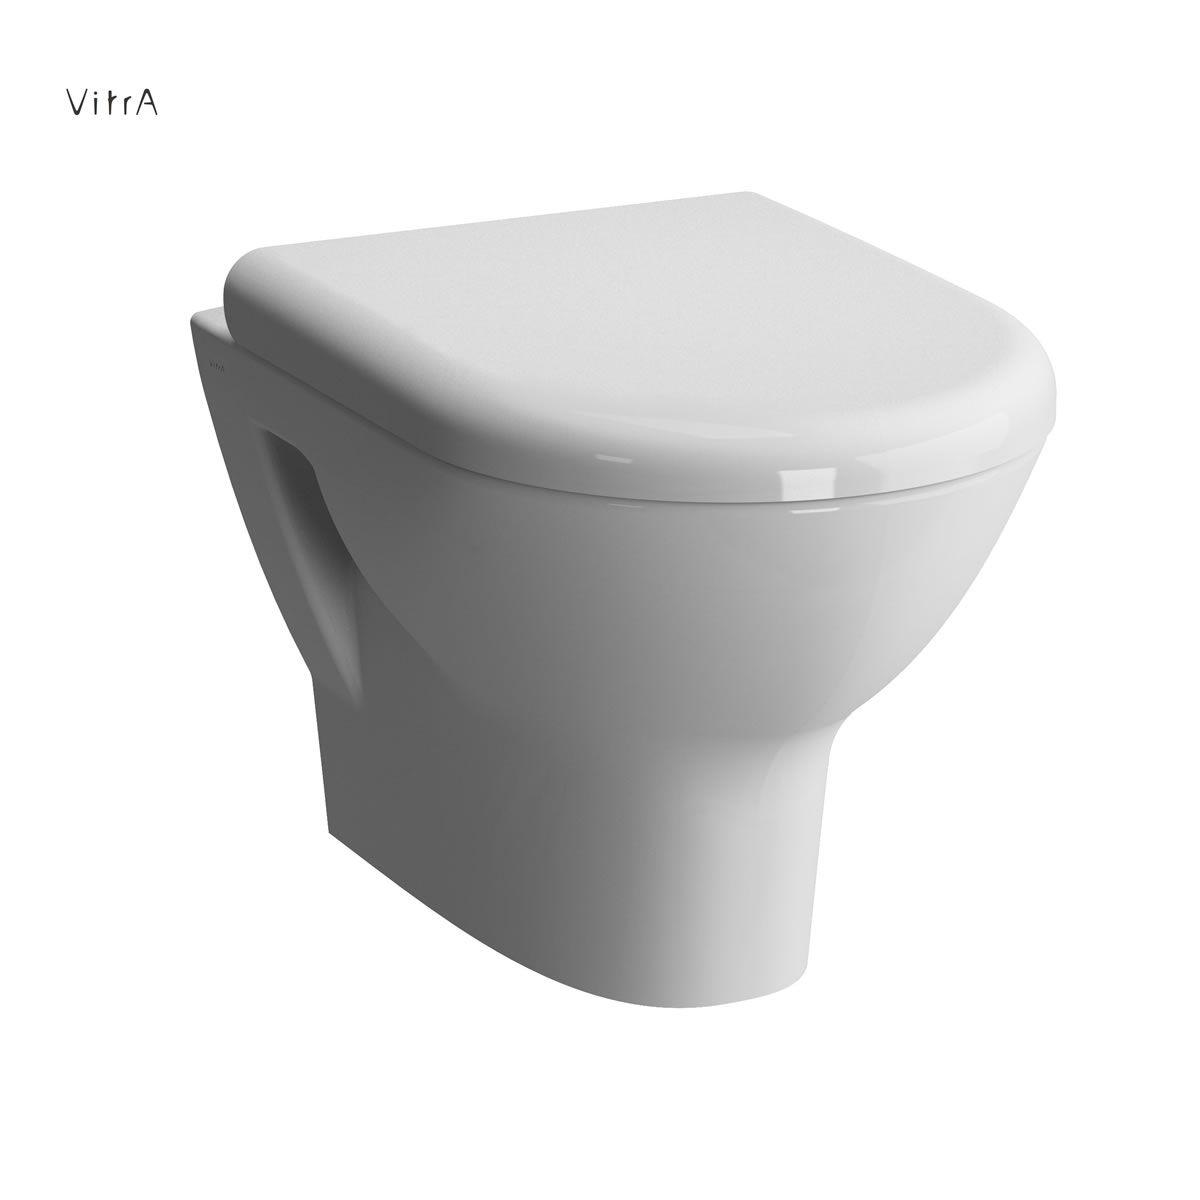 Miska WC wisząca Vitra Zentrum 5785B003-0075